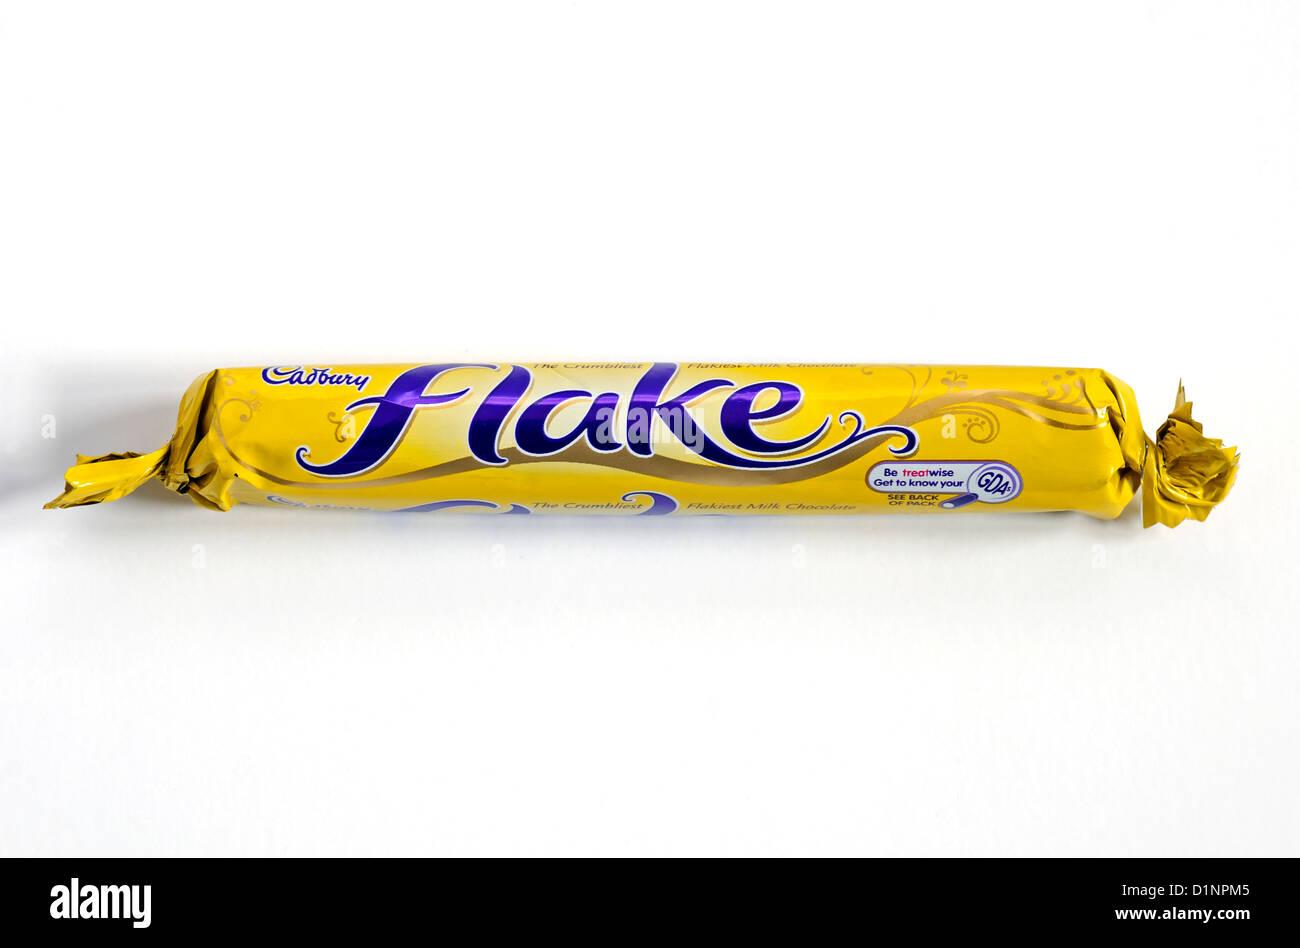 a cadbury flake bar - Stock Image